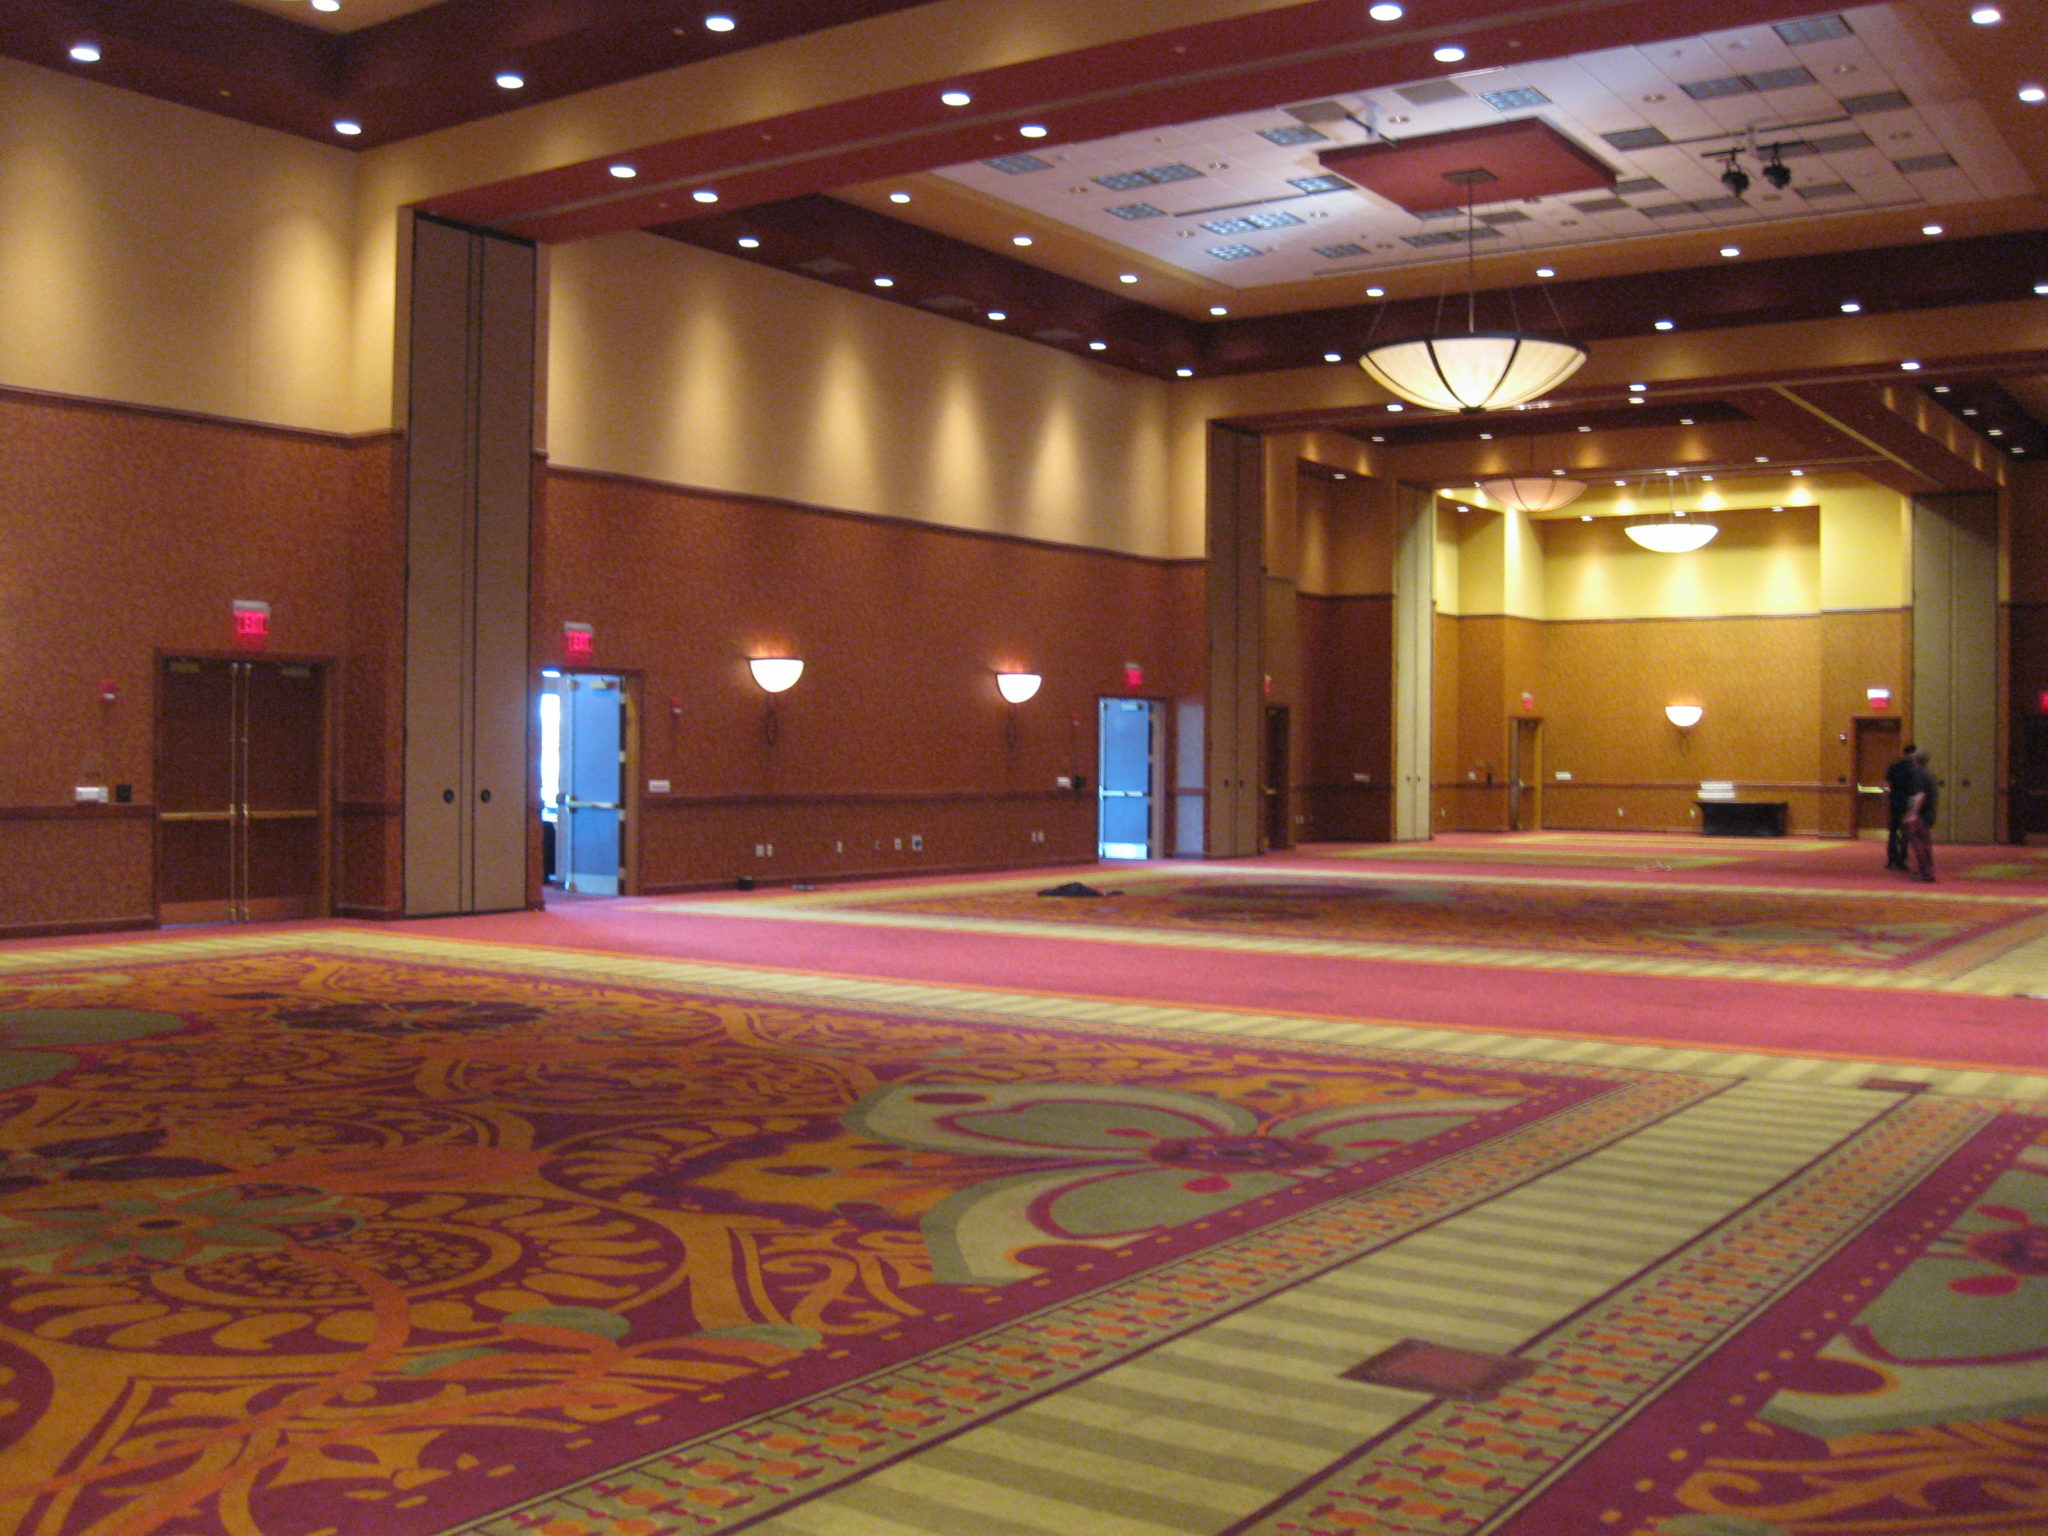 2-ballroom empty 2